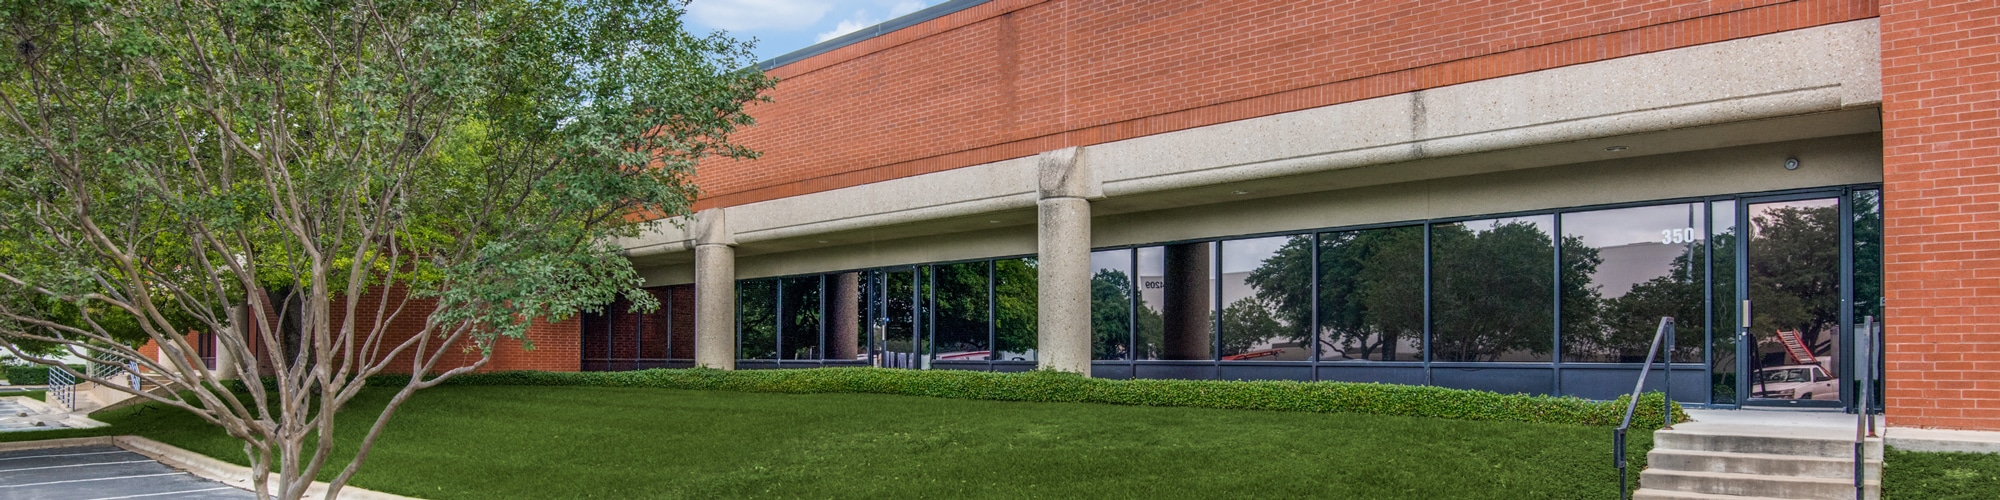 Southeast Commercial | 4120 Commercial Center Drive